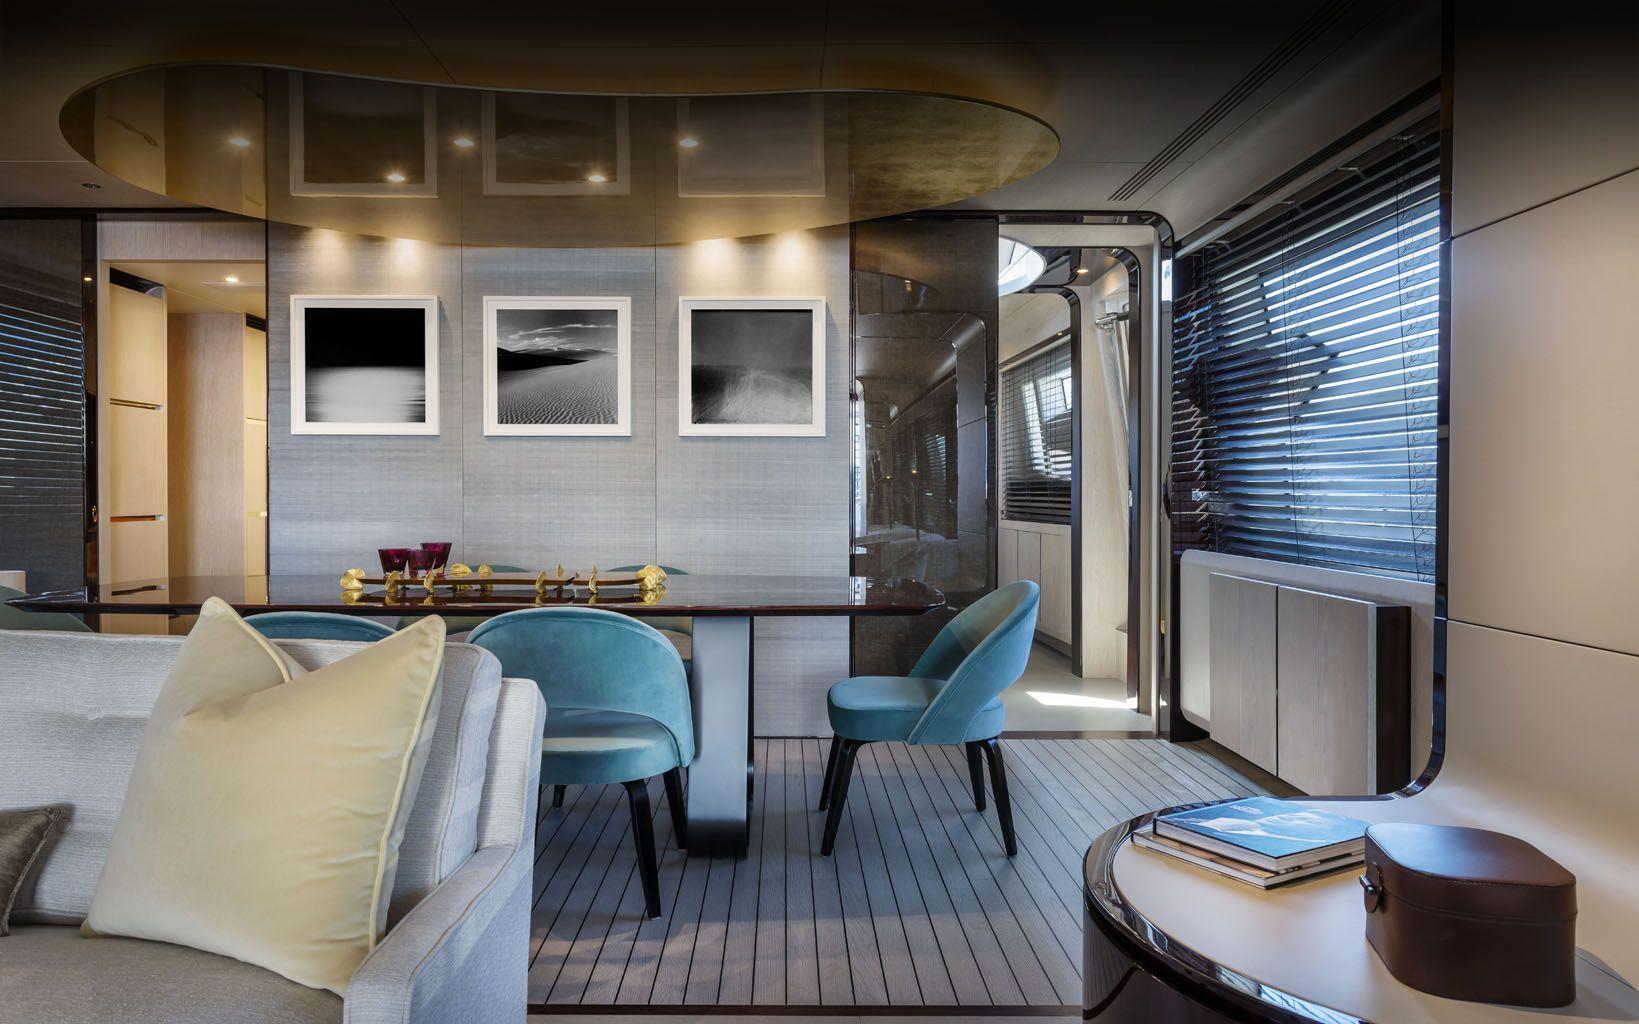 Poseidon Boat Interior Design Yacht Aircraft Design Pinterest Vs Ipad And Boats